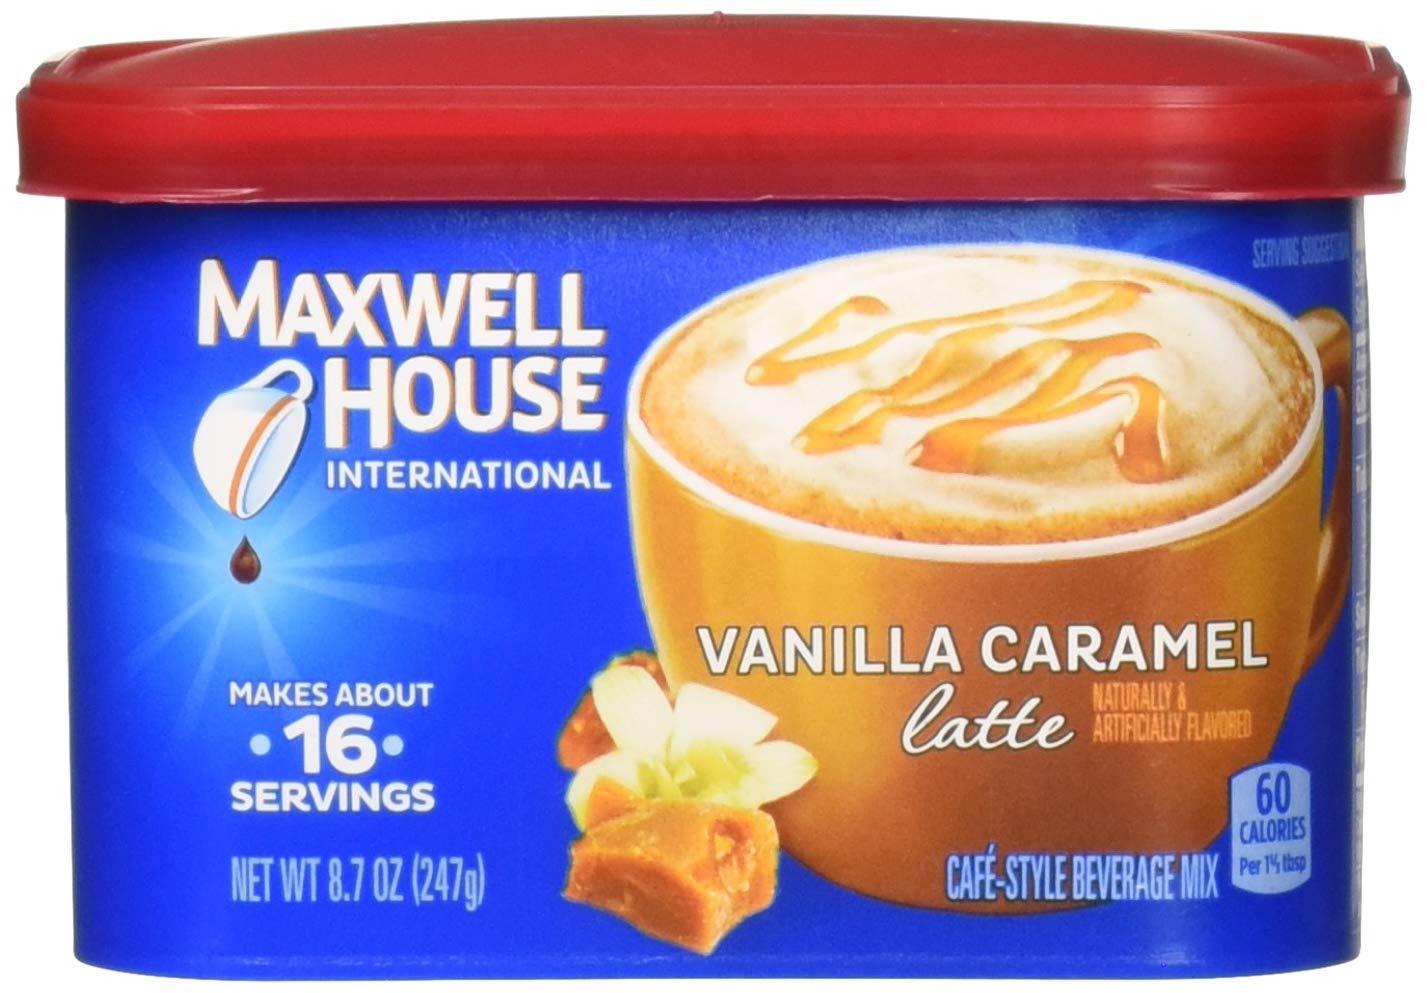 Maxwell House International Latte Caramel Insta Fees free Popularity Flavored Vanilla